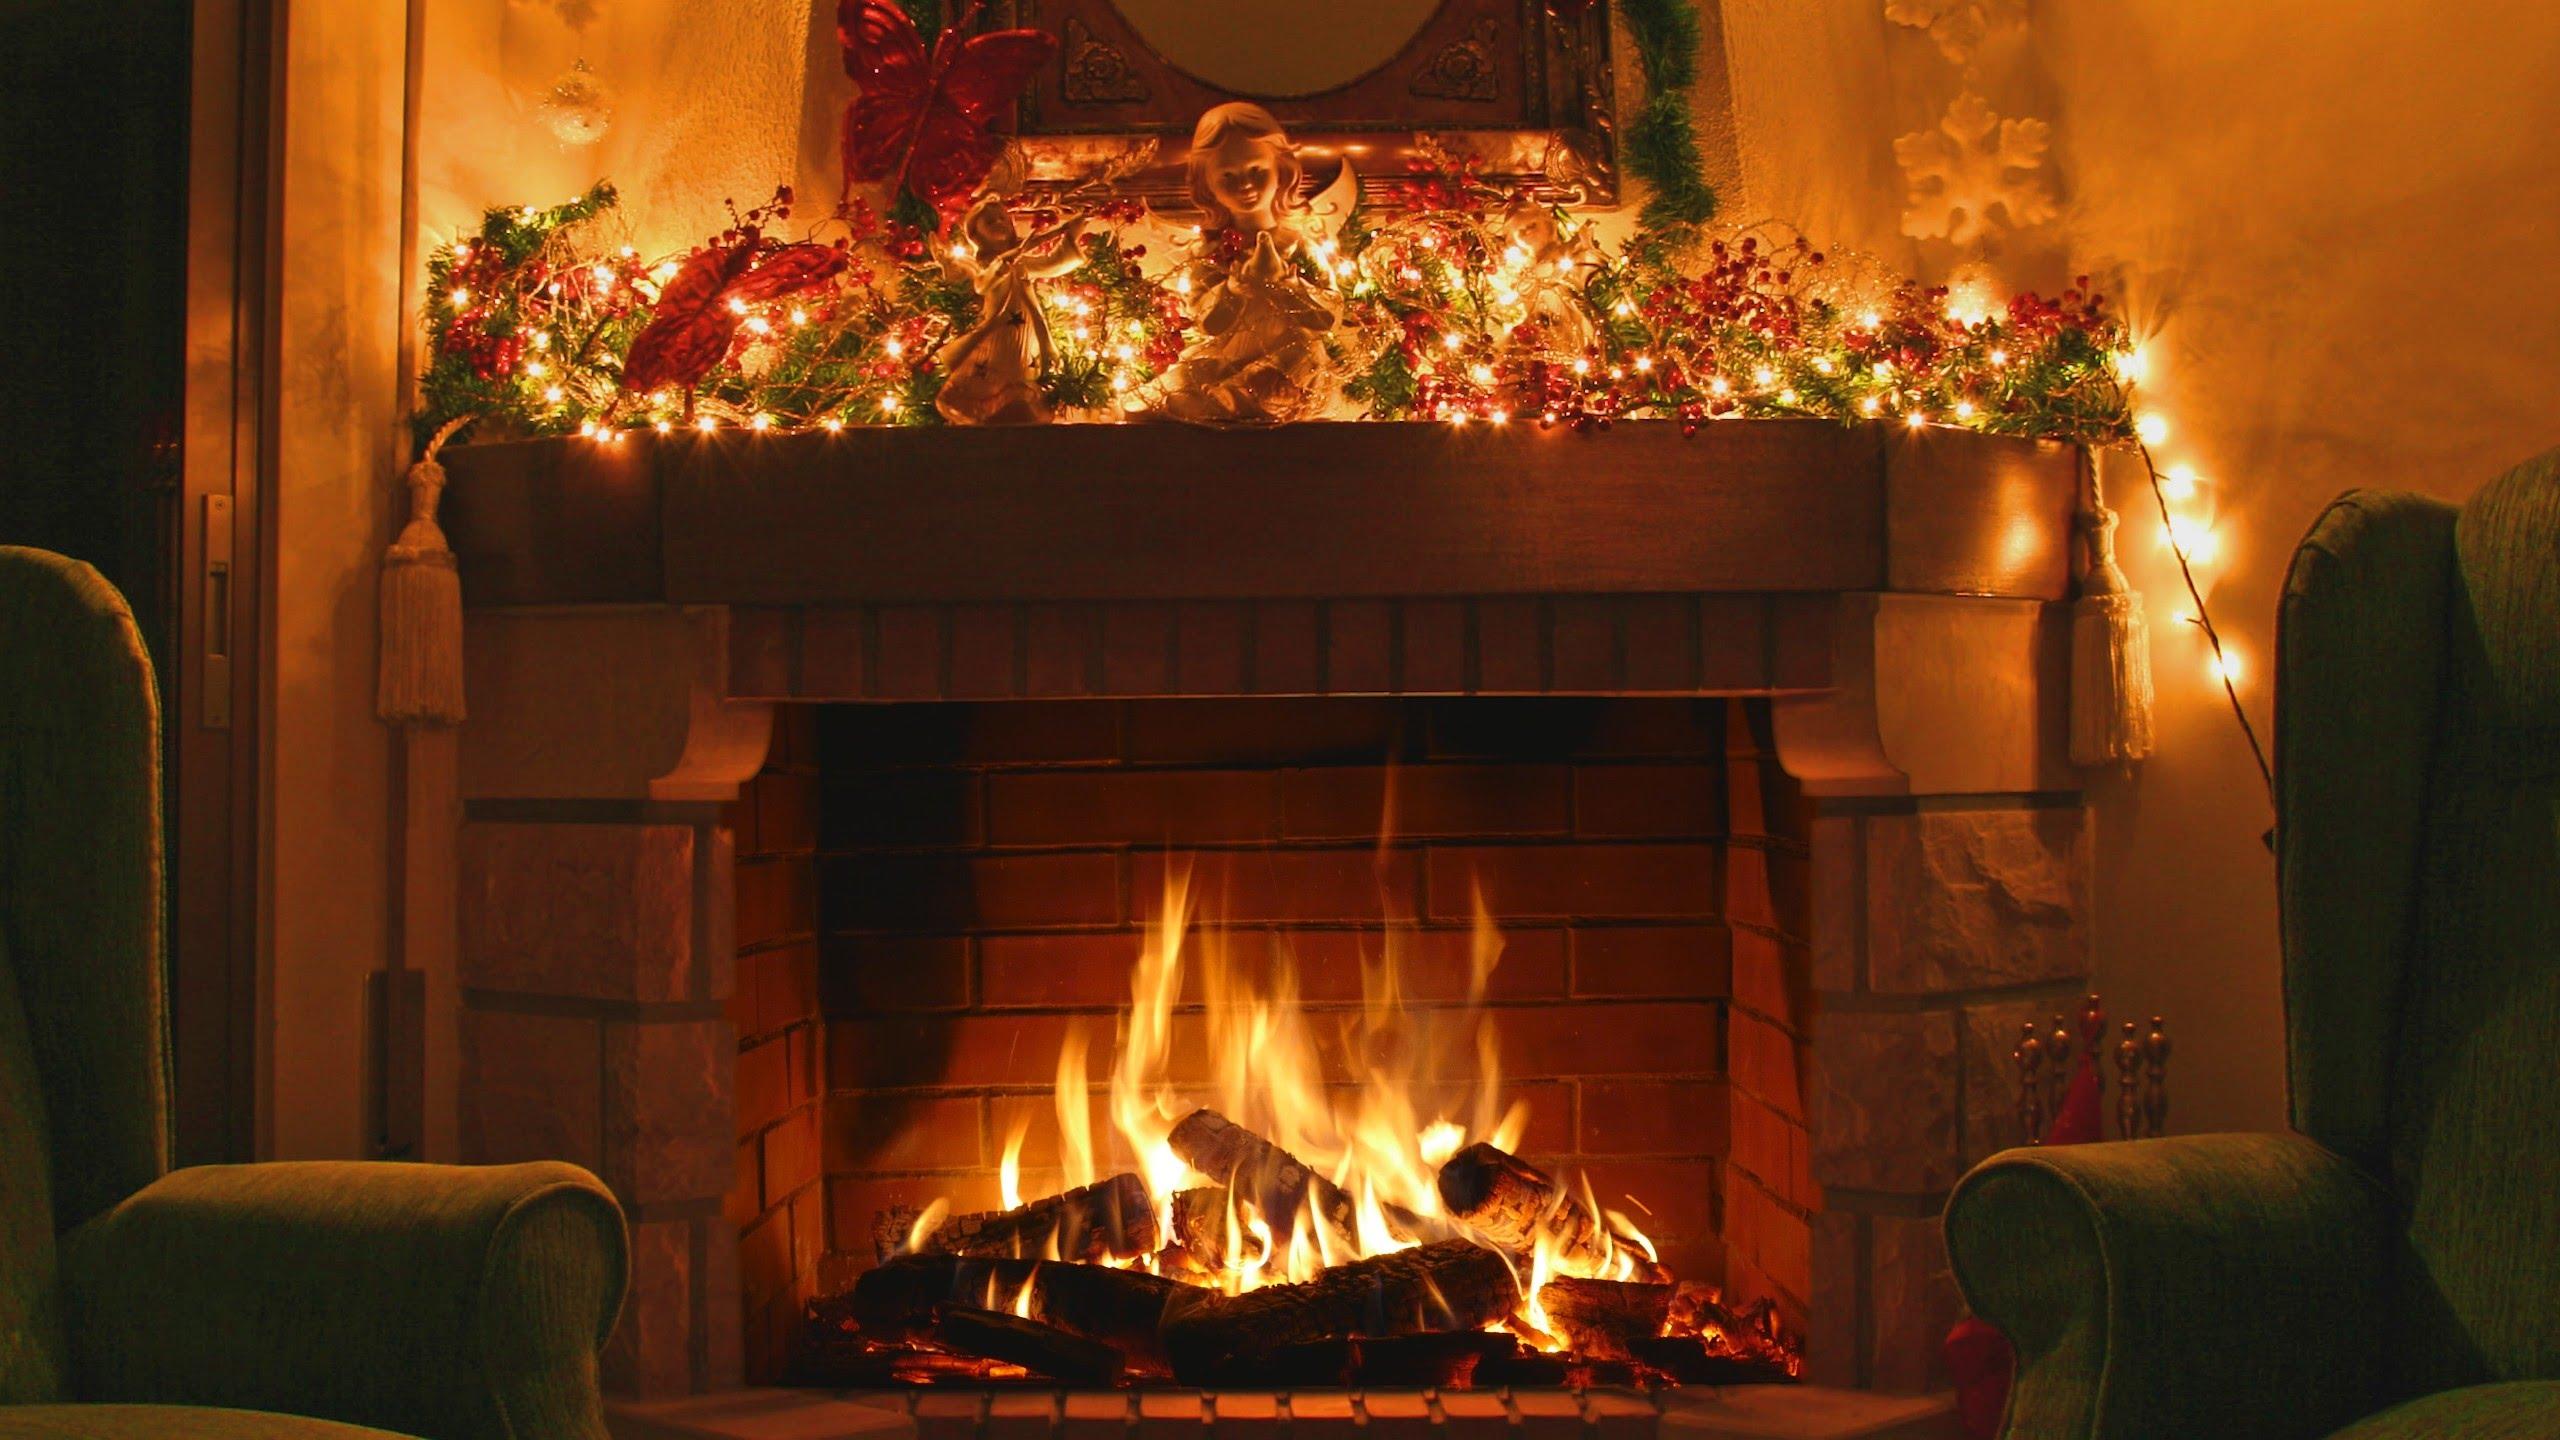 Fall Animated Wallpaper Windows 7 Free Photo Fireplace Outdoors Midsummer Fire Free